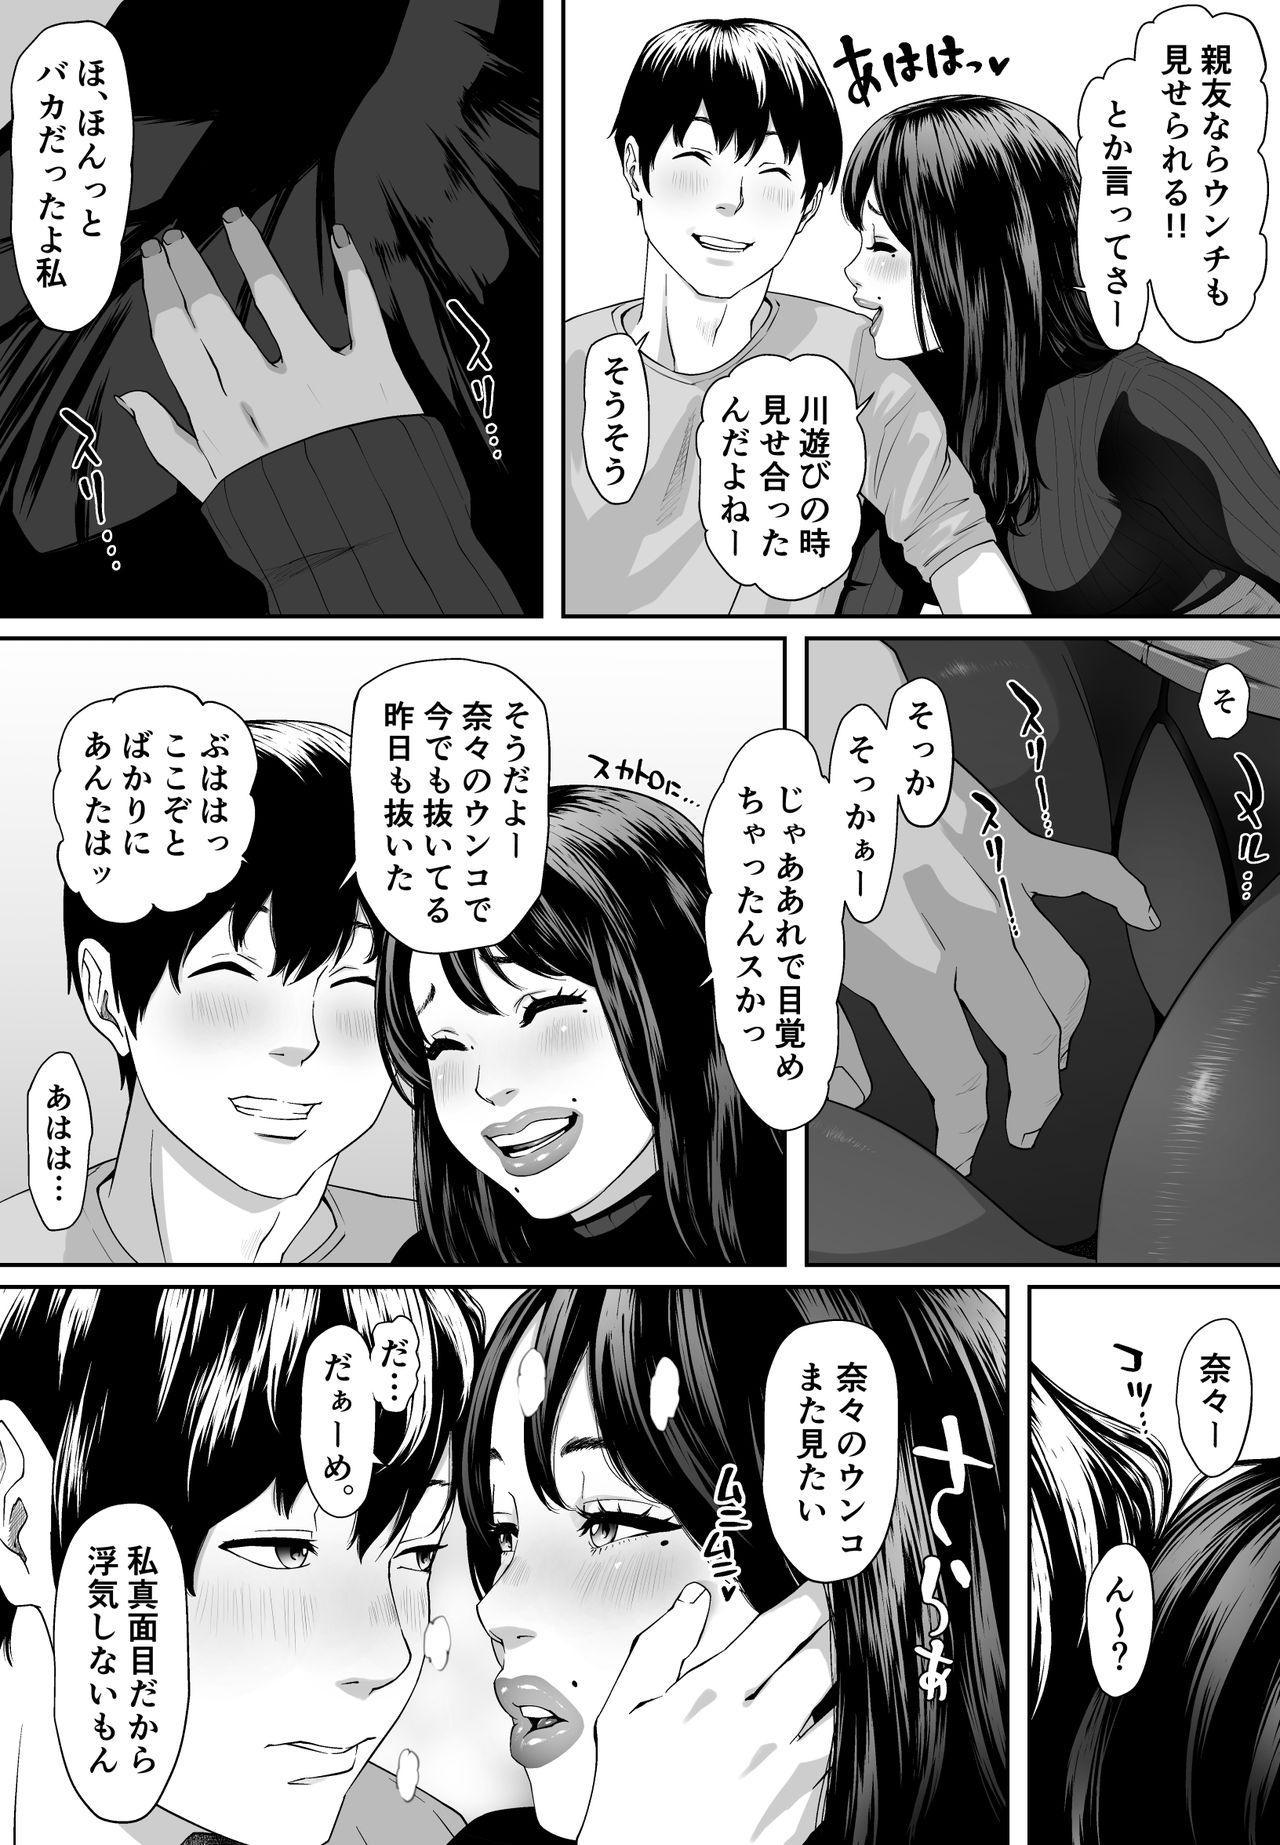 Mild Hentai NANA 16